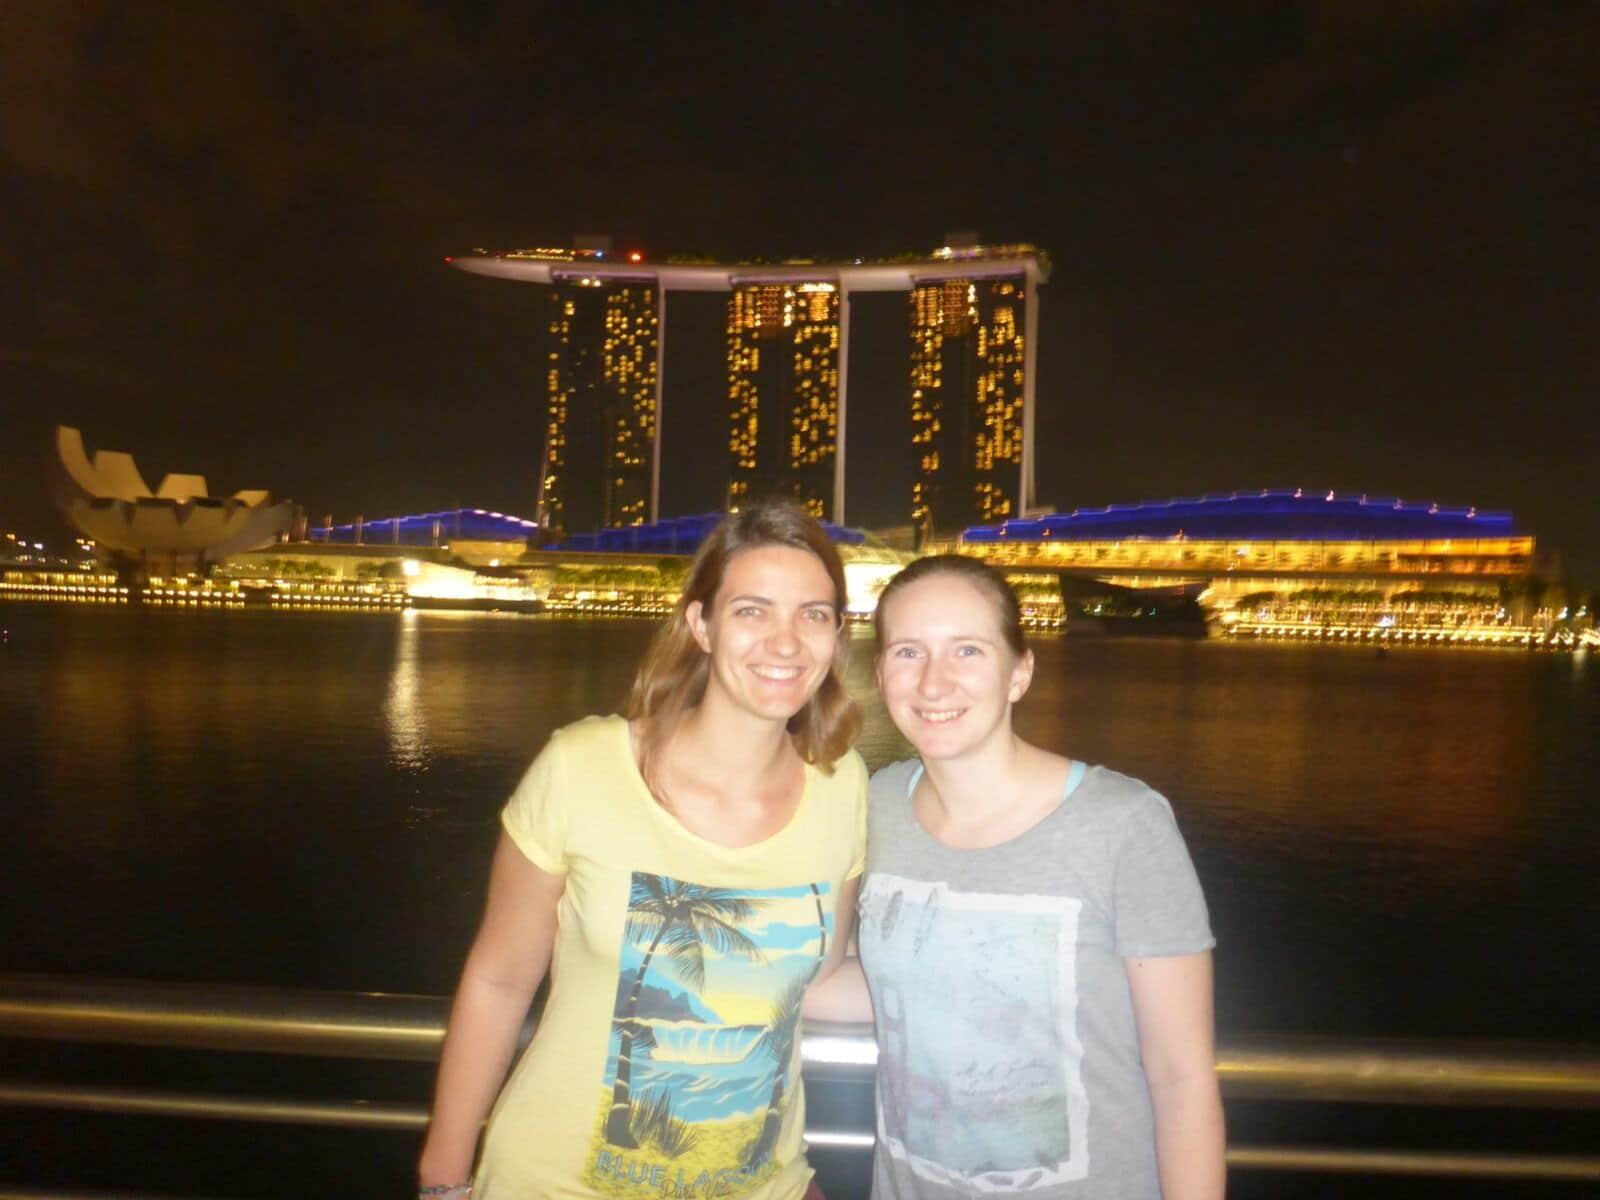 Melissa & Simone from Bonn, Germany